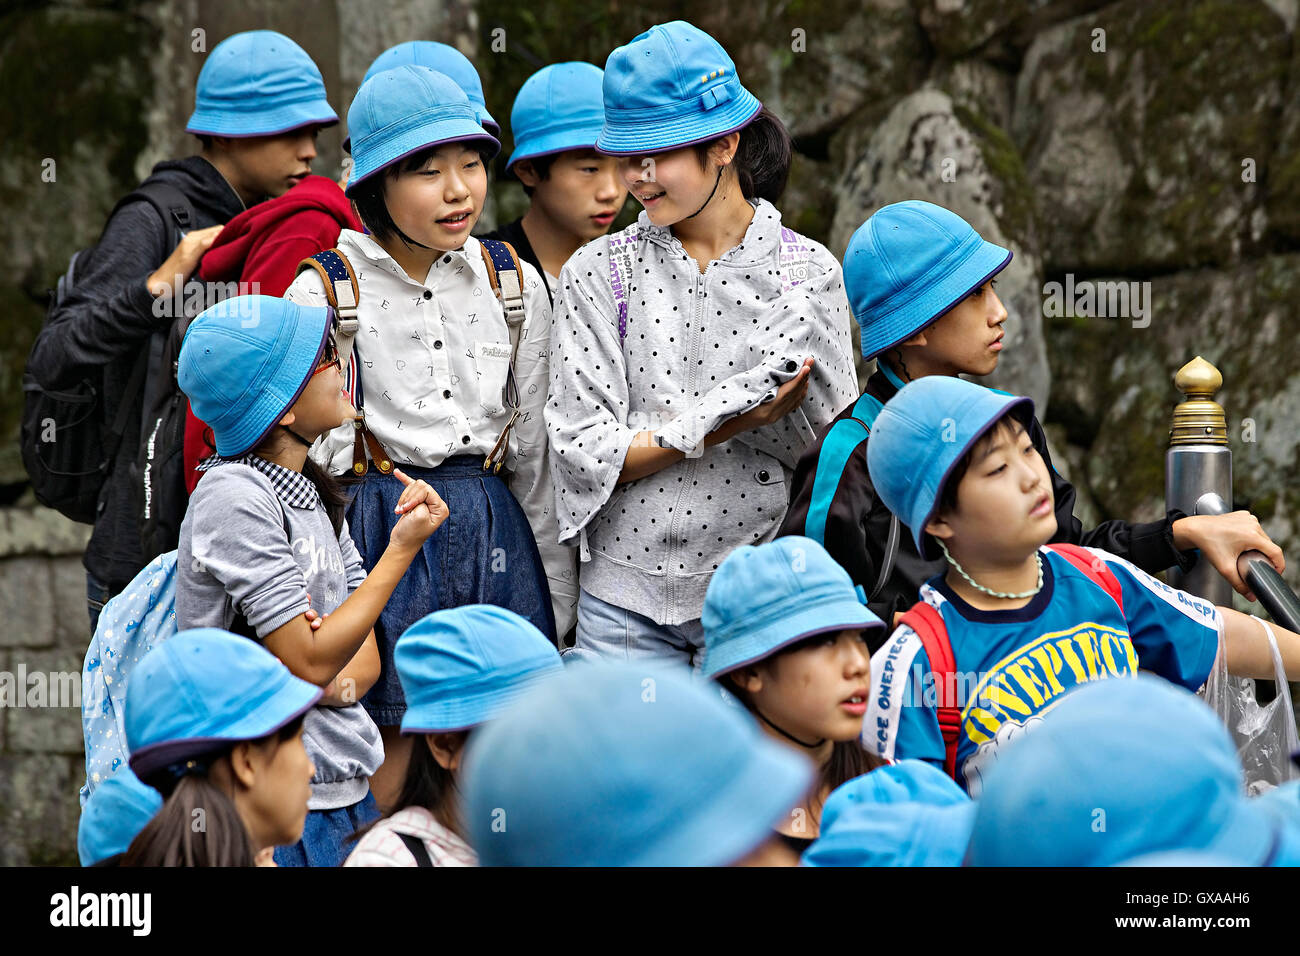 Japan, Honshu island, Kansai, Kyoto, schoolchildren. - Stock Image